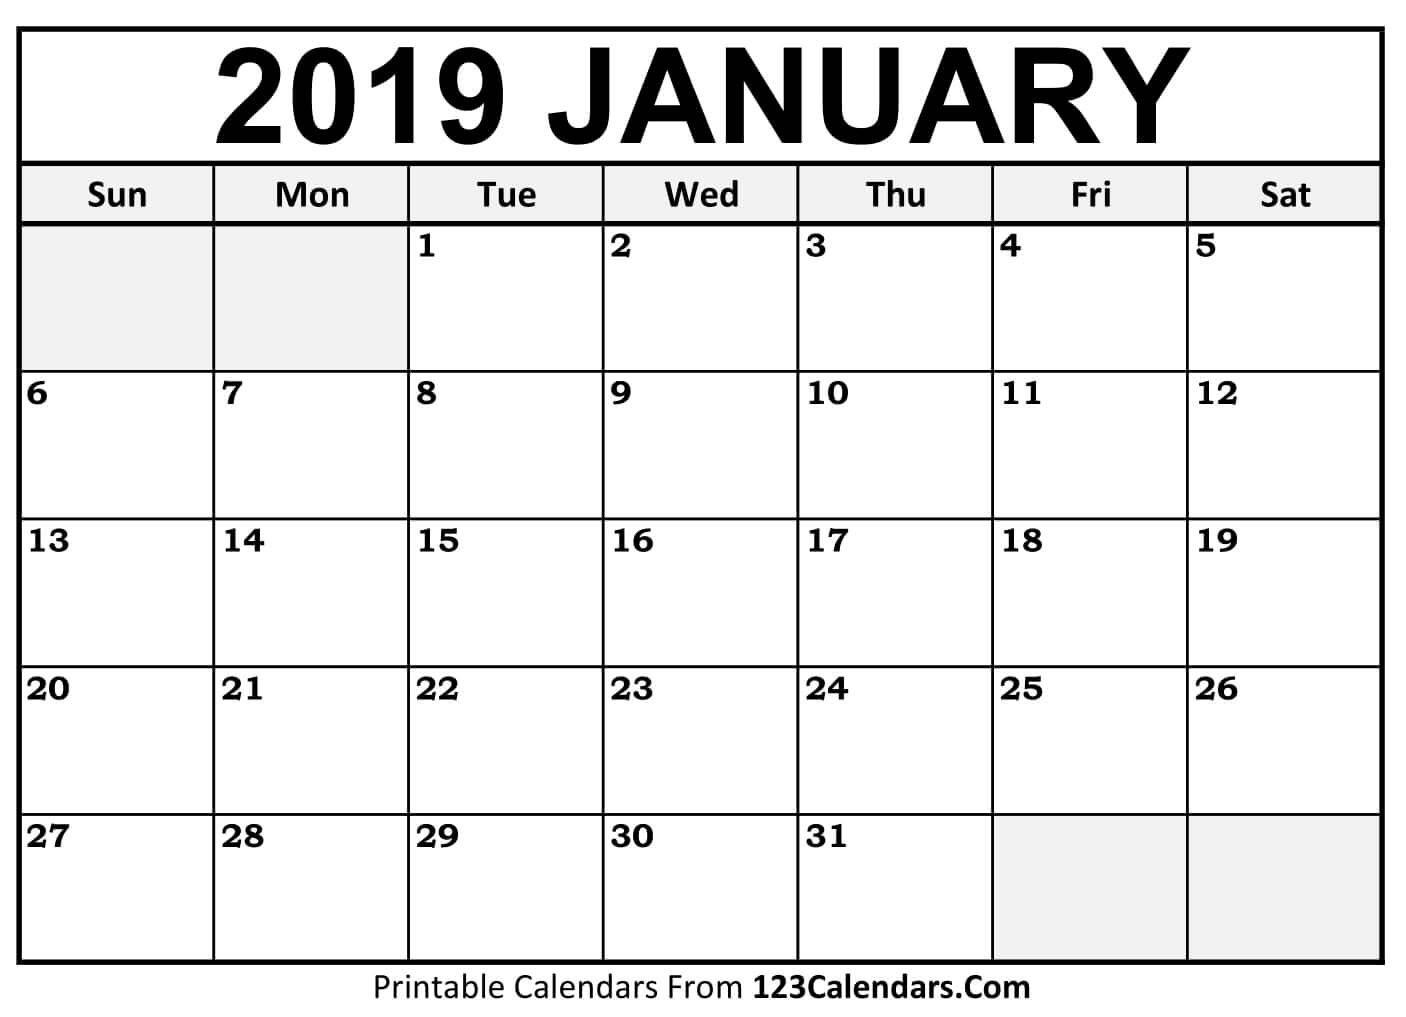 Printable January 2019 Calendar Templates - 123Calendars Calendar 2019 January